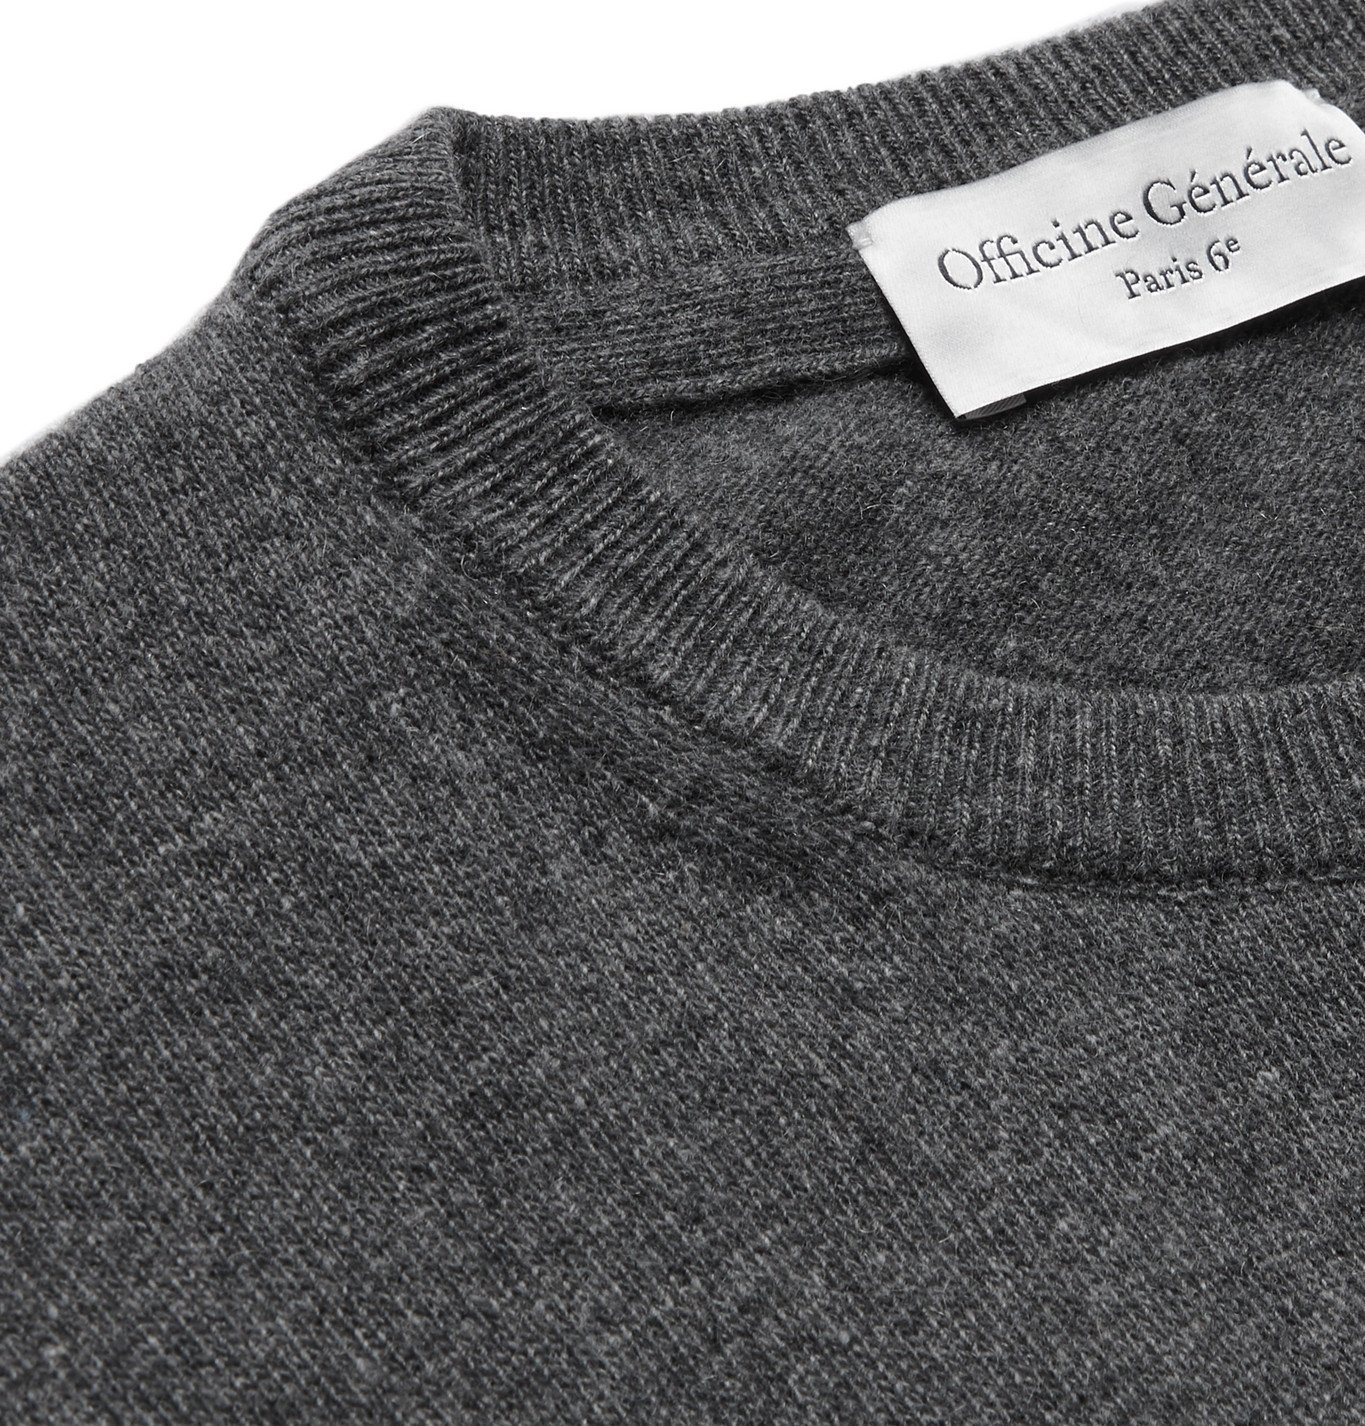 Officine Generale - Nina Mélange Cashmere Sweater - Gray